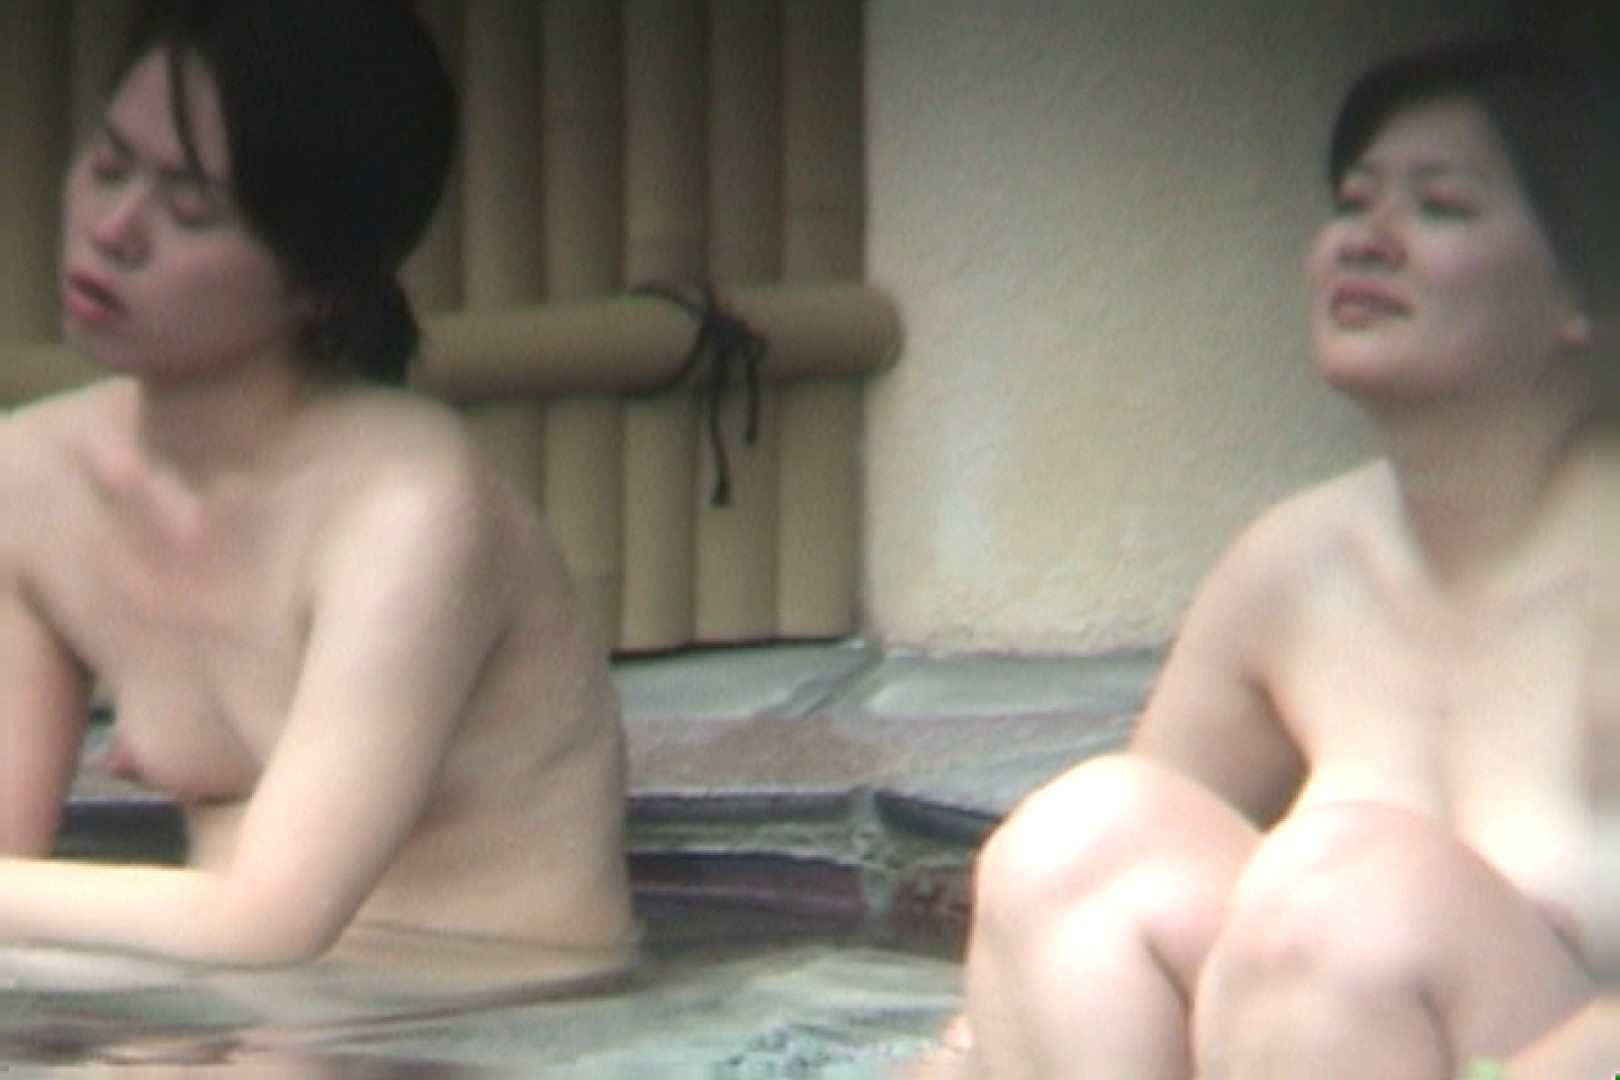 Aquaな露天風呂Vol.558 美しいOLの裸体 AV無料動画キャプチャ 86pic 32